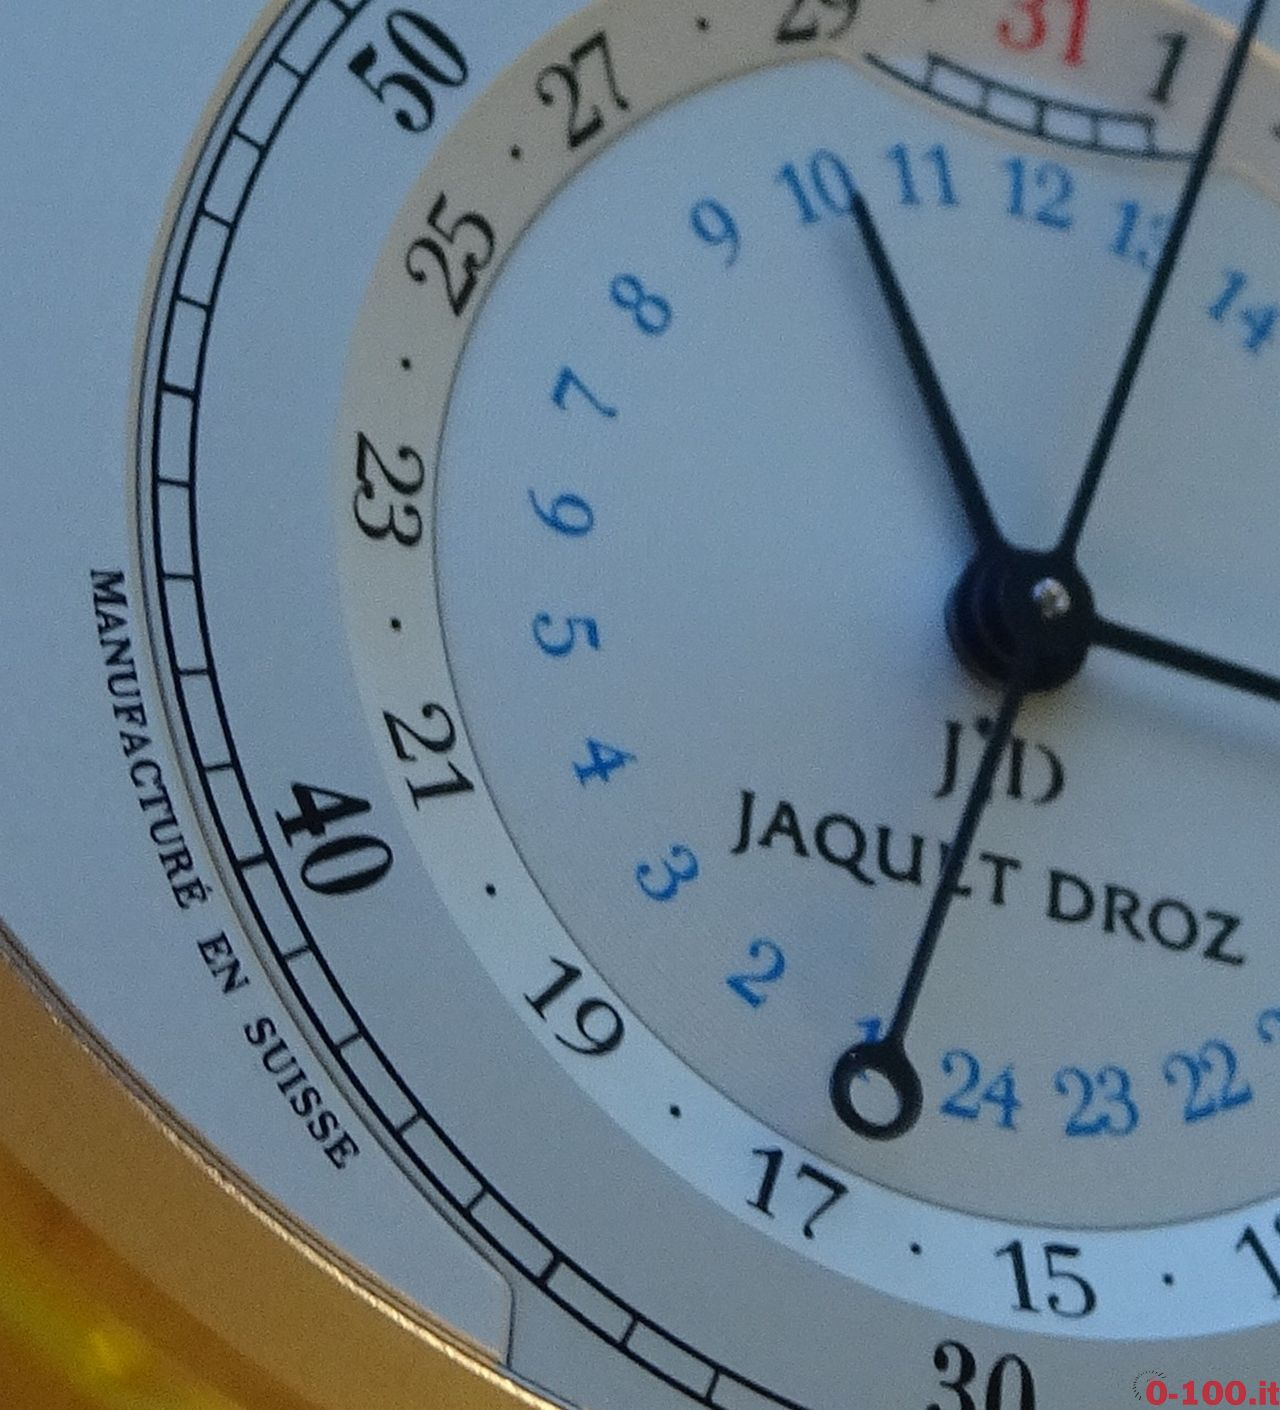 gli-speciali-di-0-100-it-jaquet-droz-la-manifattura-di-la-chaux-de-fonds_0-1007